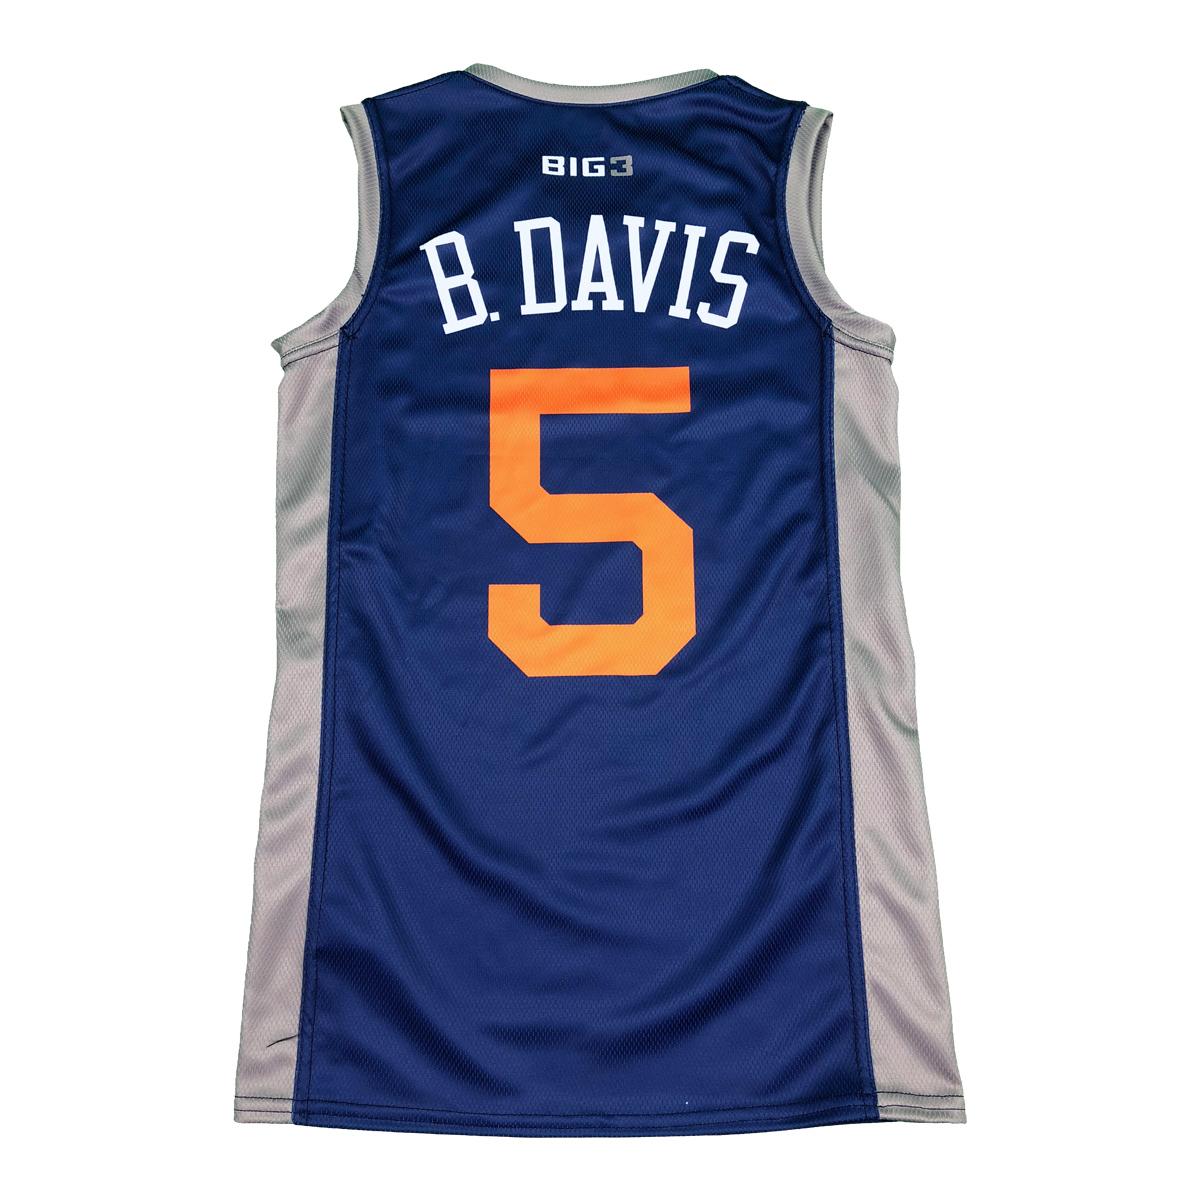 B. Davis Jersey